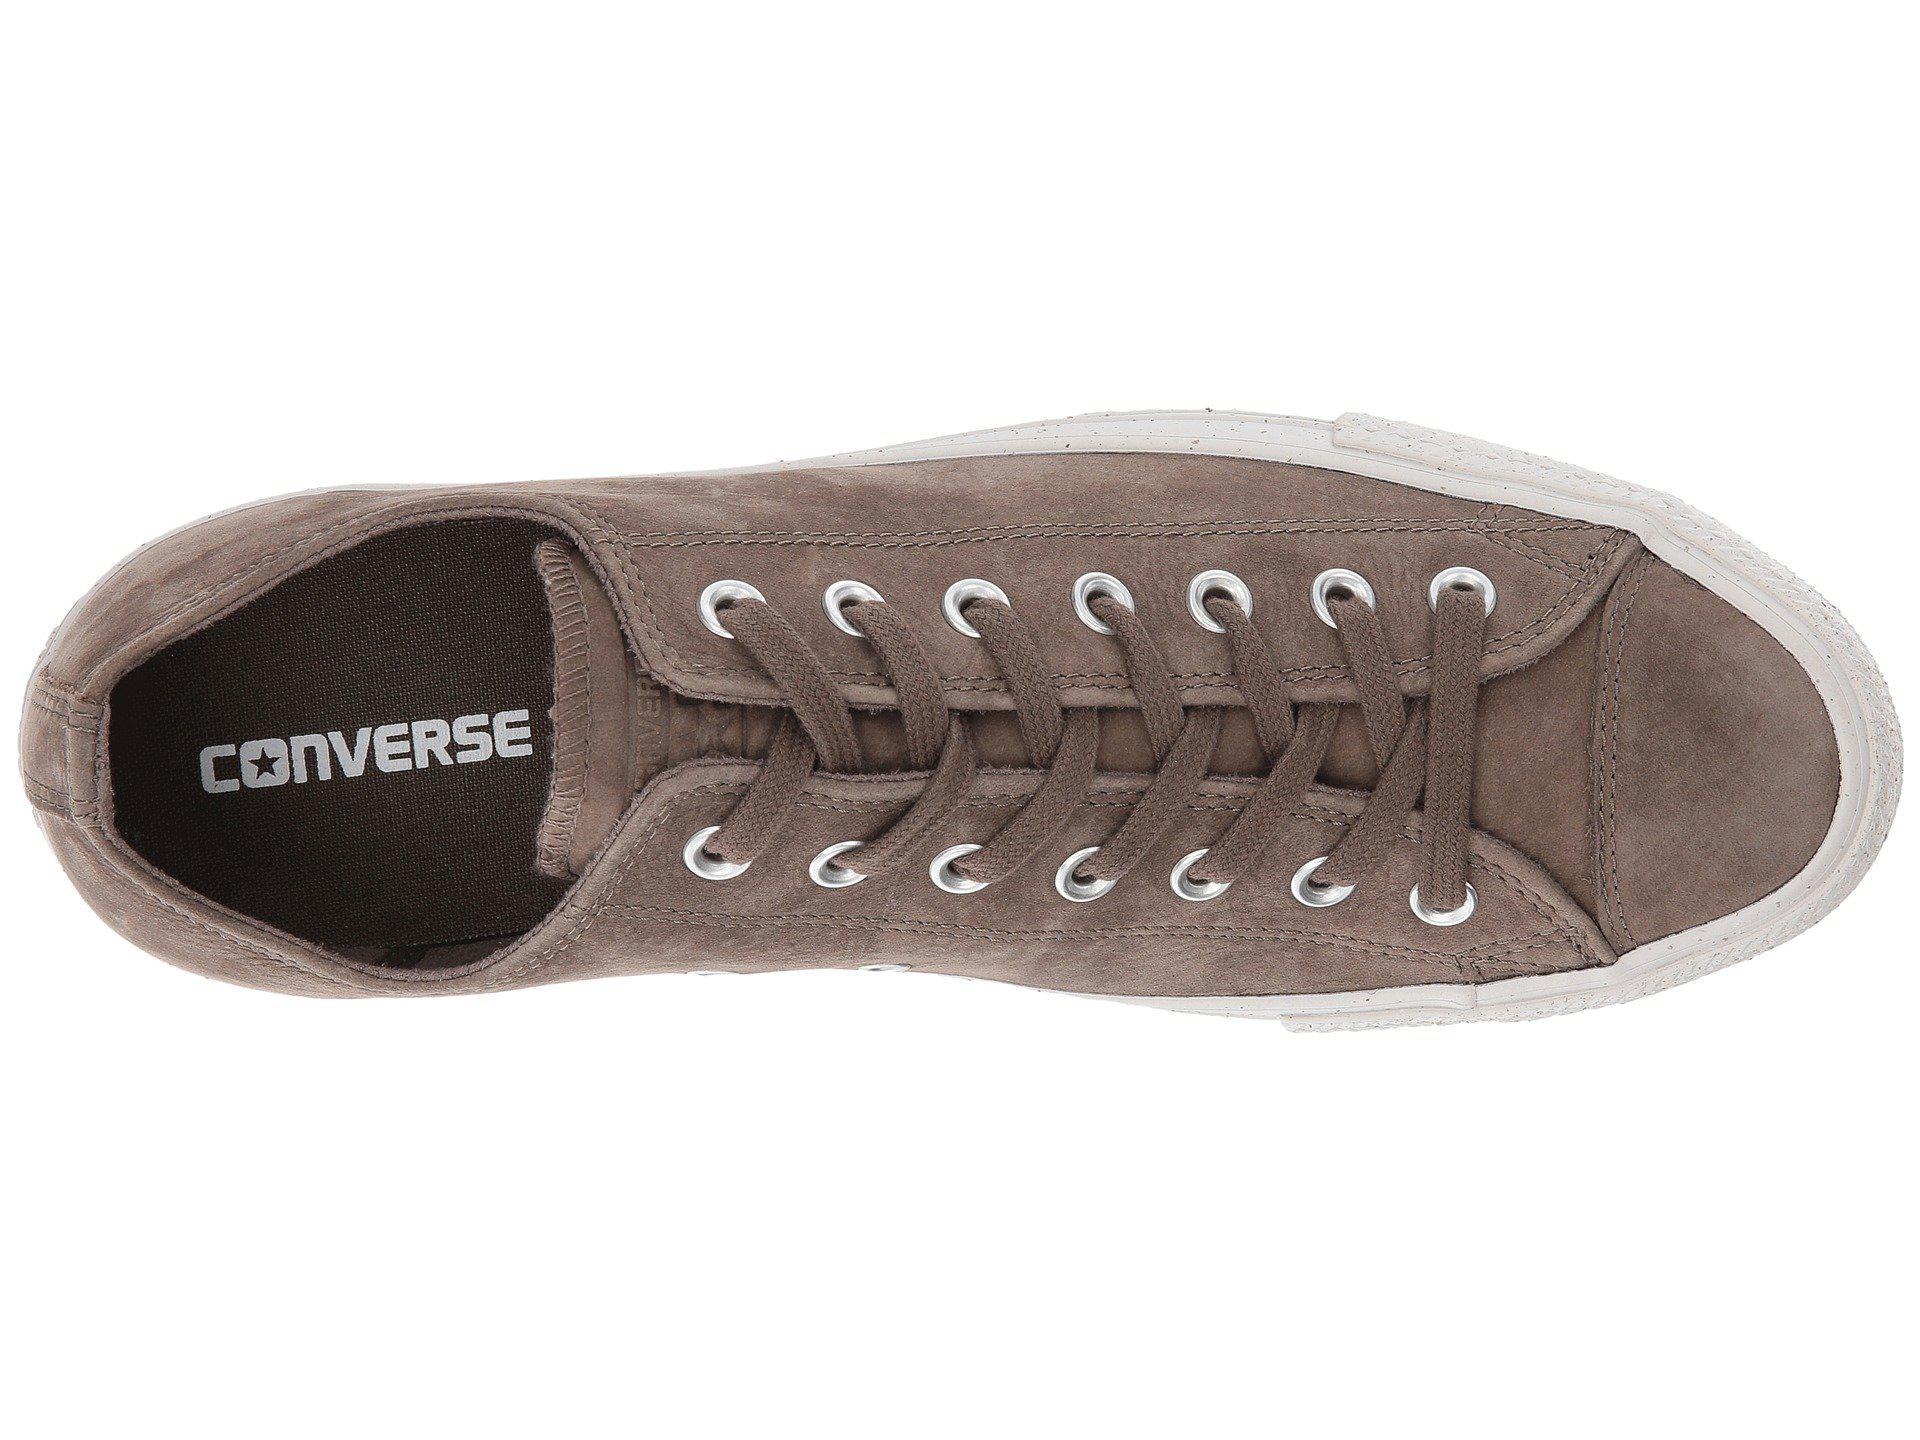 673e8c47ab26 Converse - Multicolor Chuck Taylor All Star Nubuck Ox - Lyst. View  fullscreen